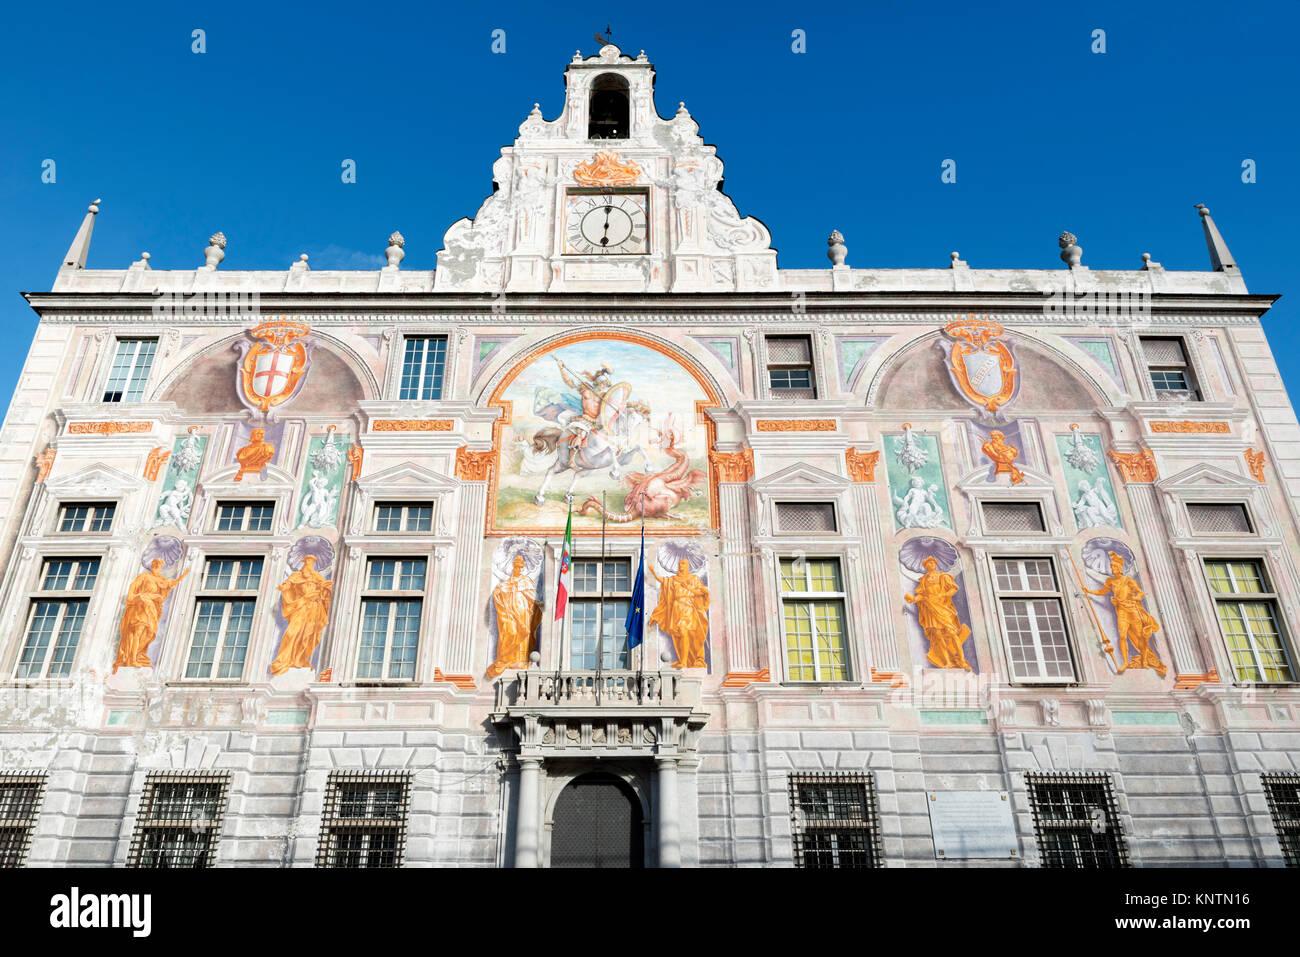 Facade of the Palazzo San Giorgio (Palace of St George) in the port area, Piazza Caricamento, Genoa, Liguria, Italy - Stock Image